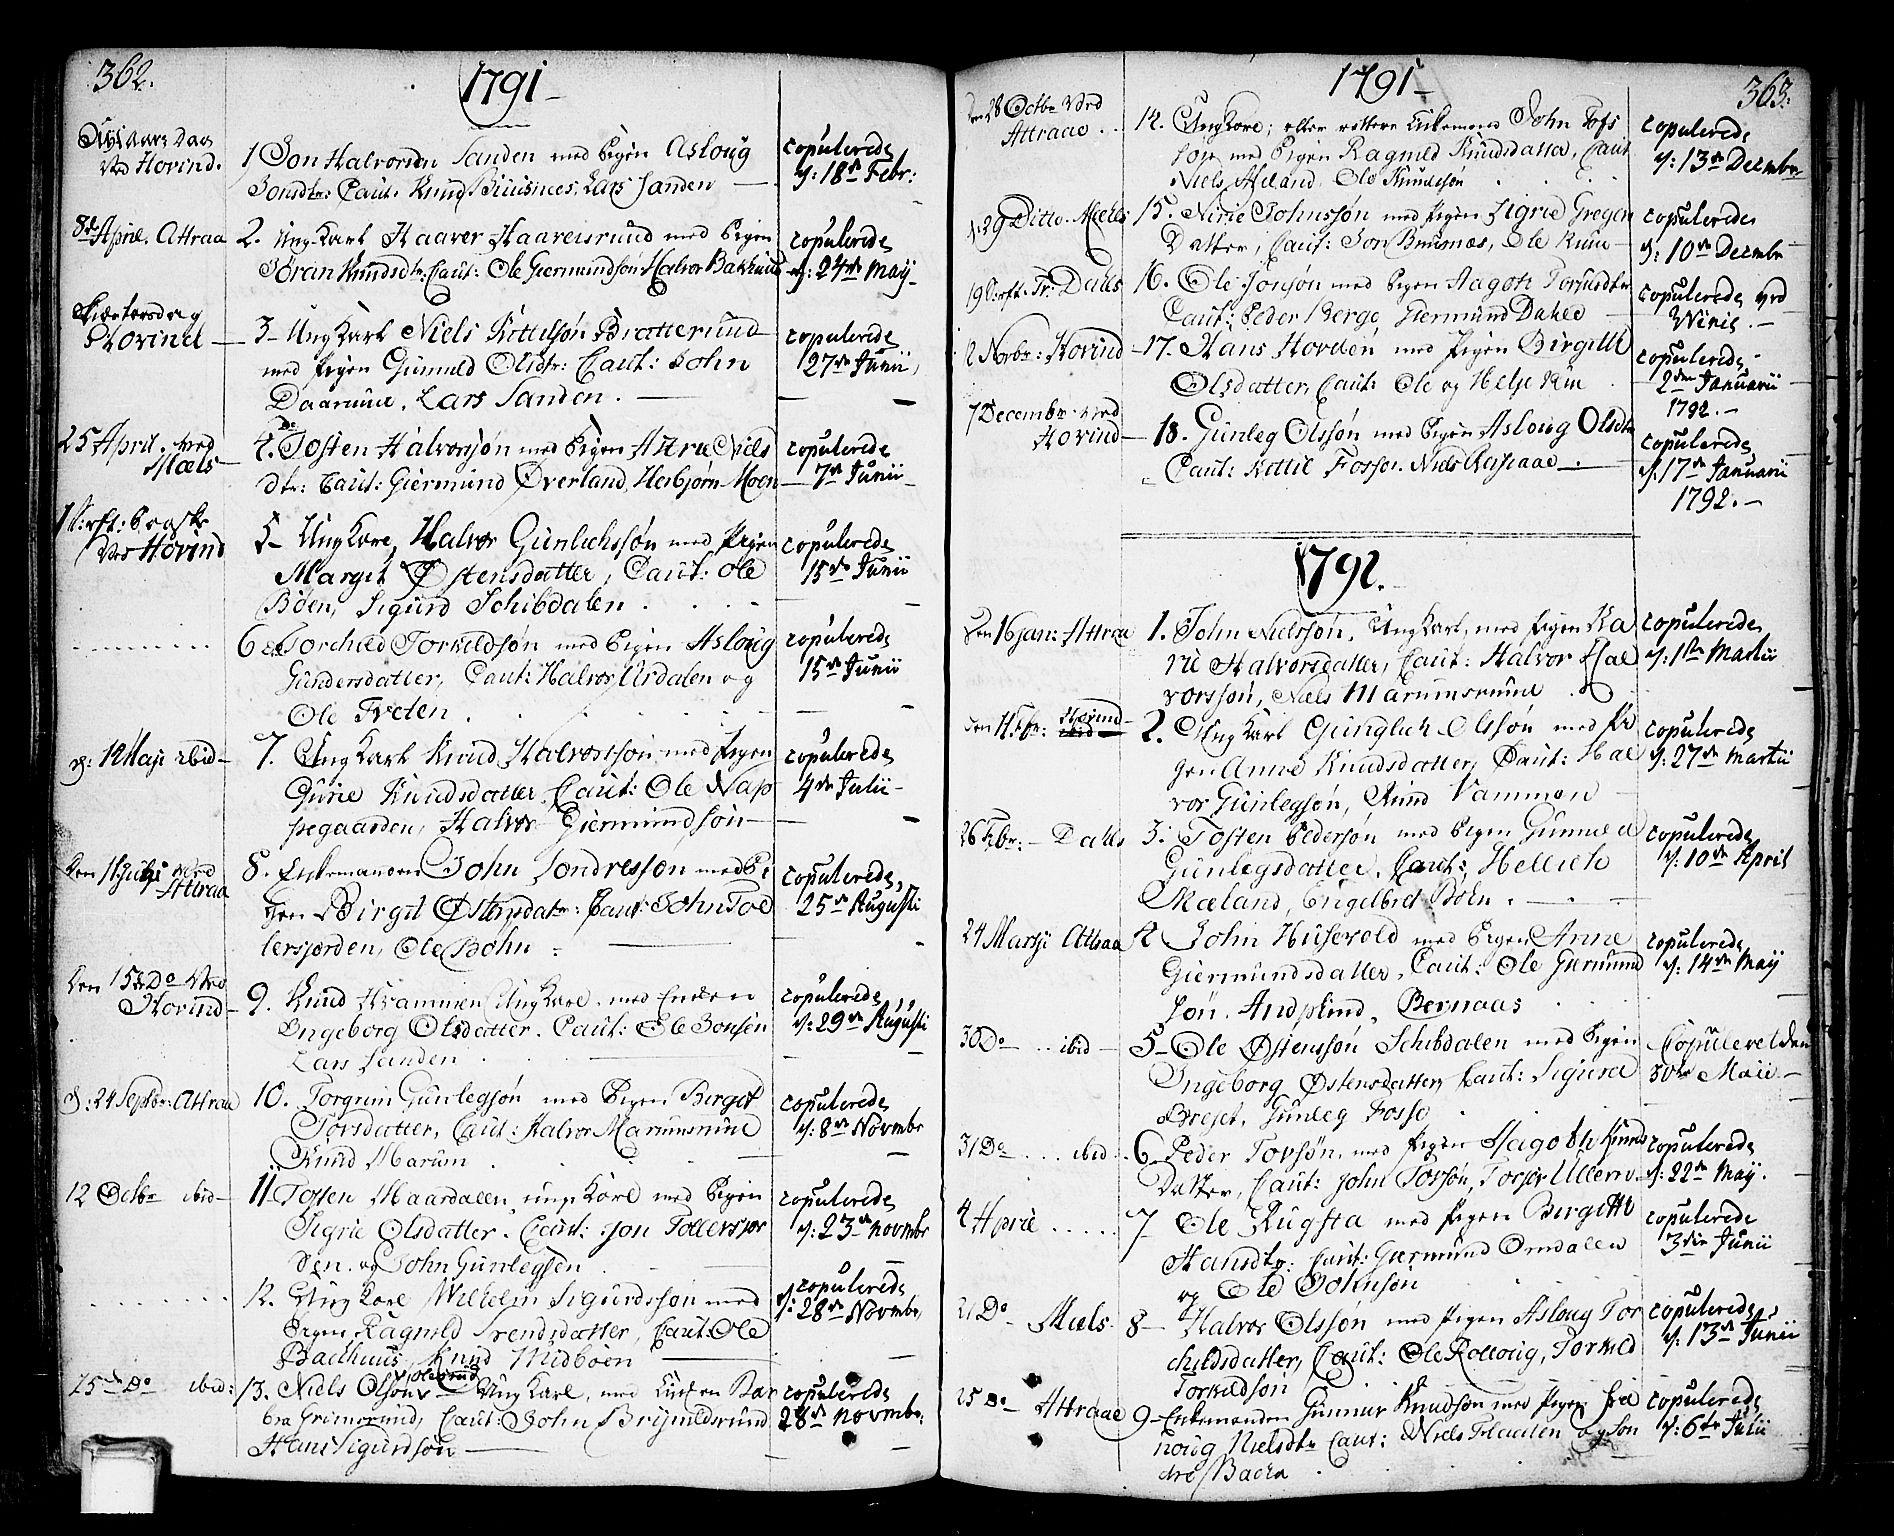 SAKO, Tinn kirkebøker, F/Fa/L0002: Ministerialbok nr. I 2, 1757-1810, s. 362-363